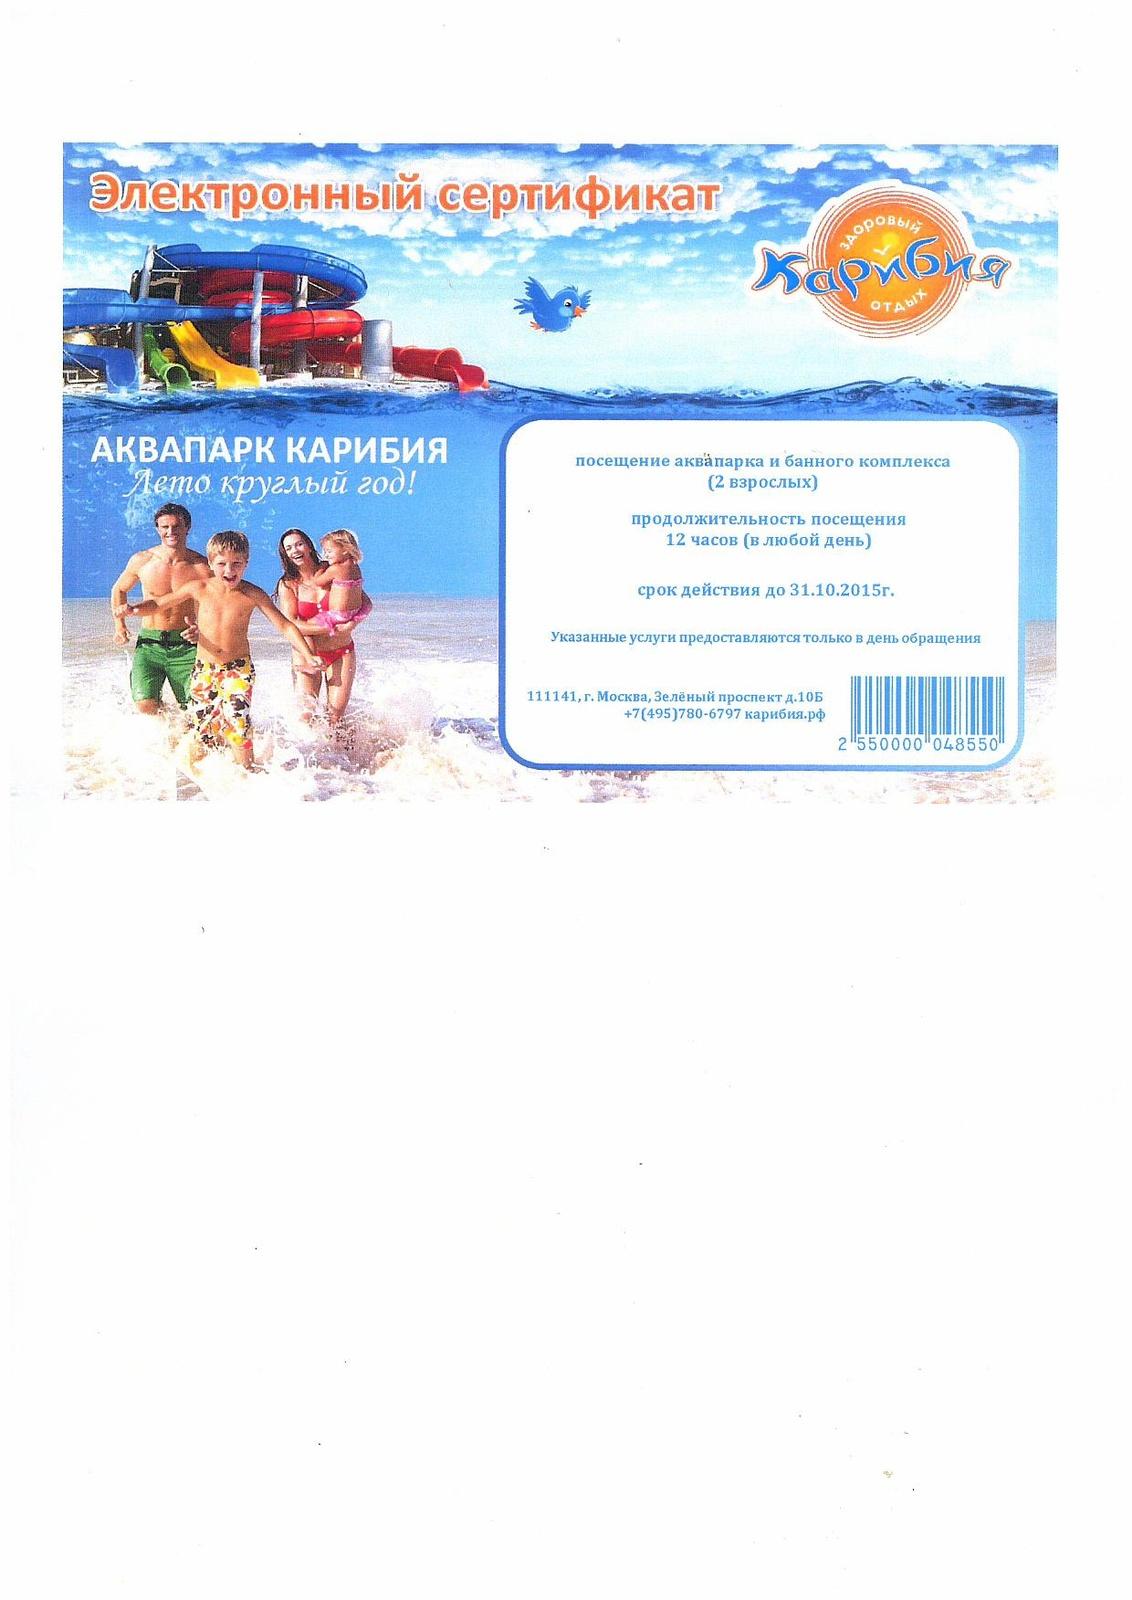 Новости - Билеты в Аквапарк в подарок! - Оркестра Горизонт 84